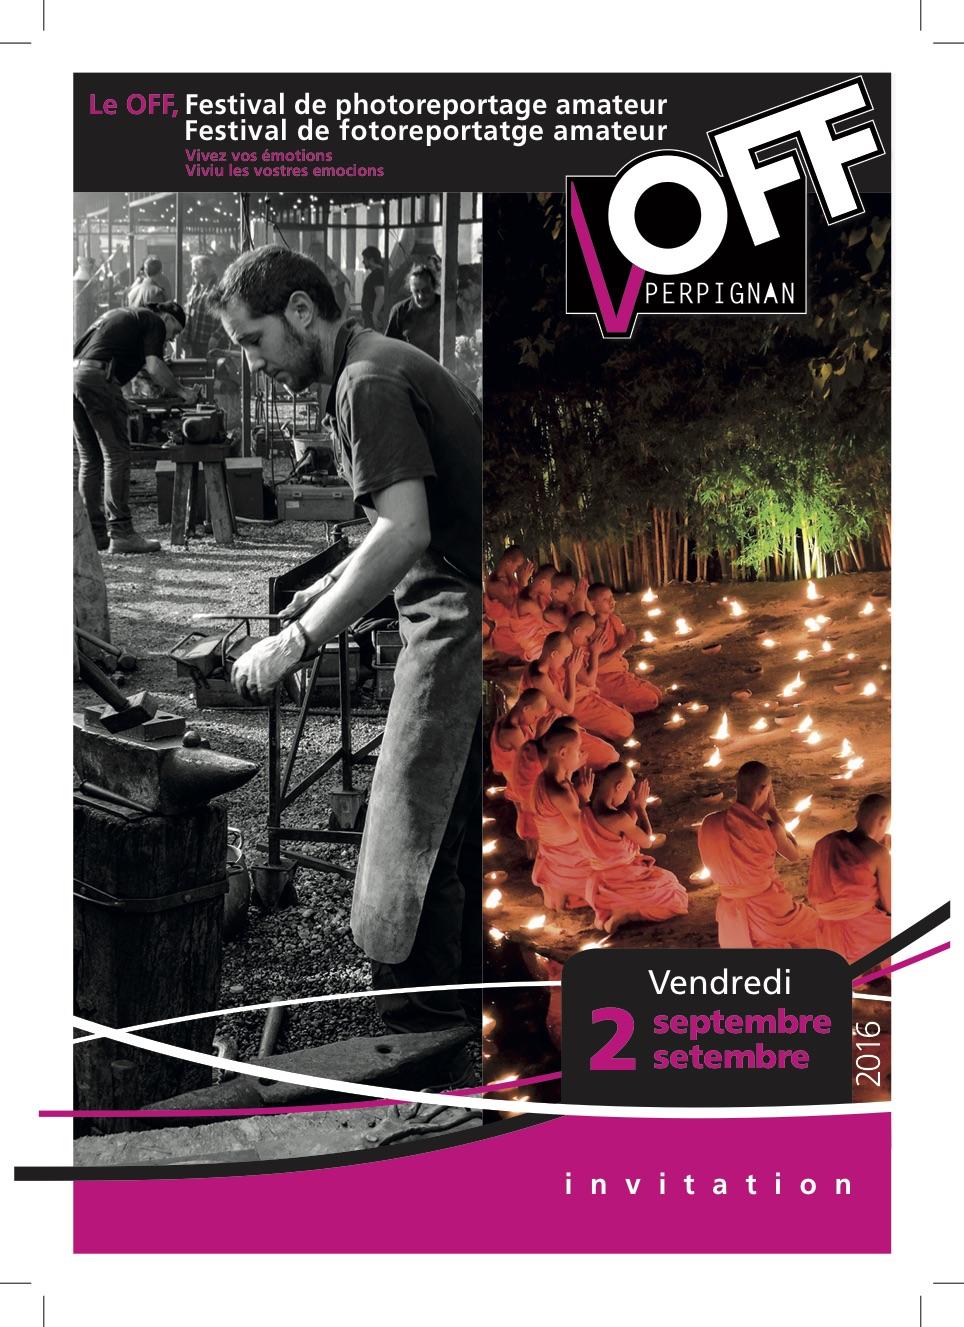 Delmas Musique invit2septvernissagevoff26-2016 Exposition Festival Visa OFF 2016 chez Delmas Musique